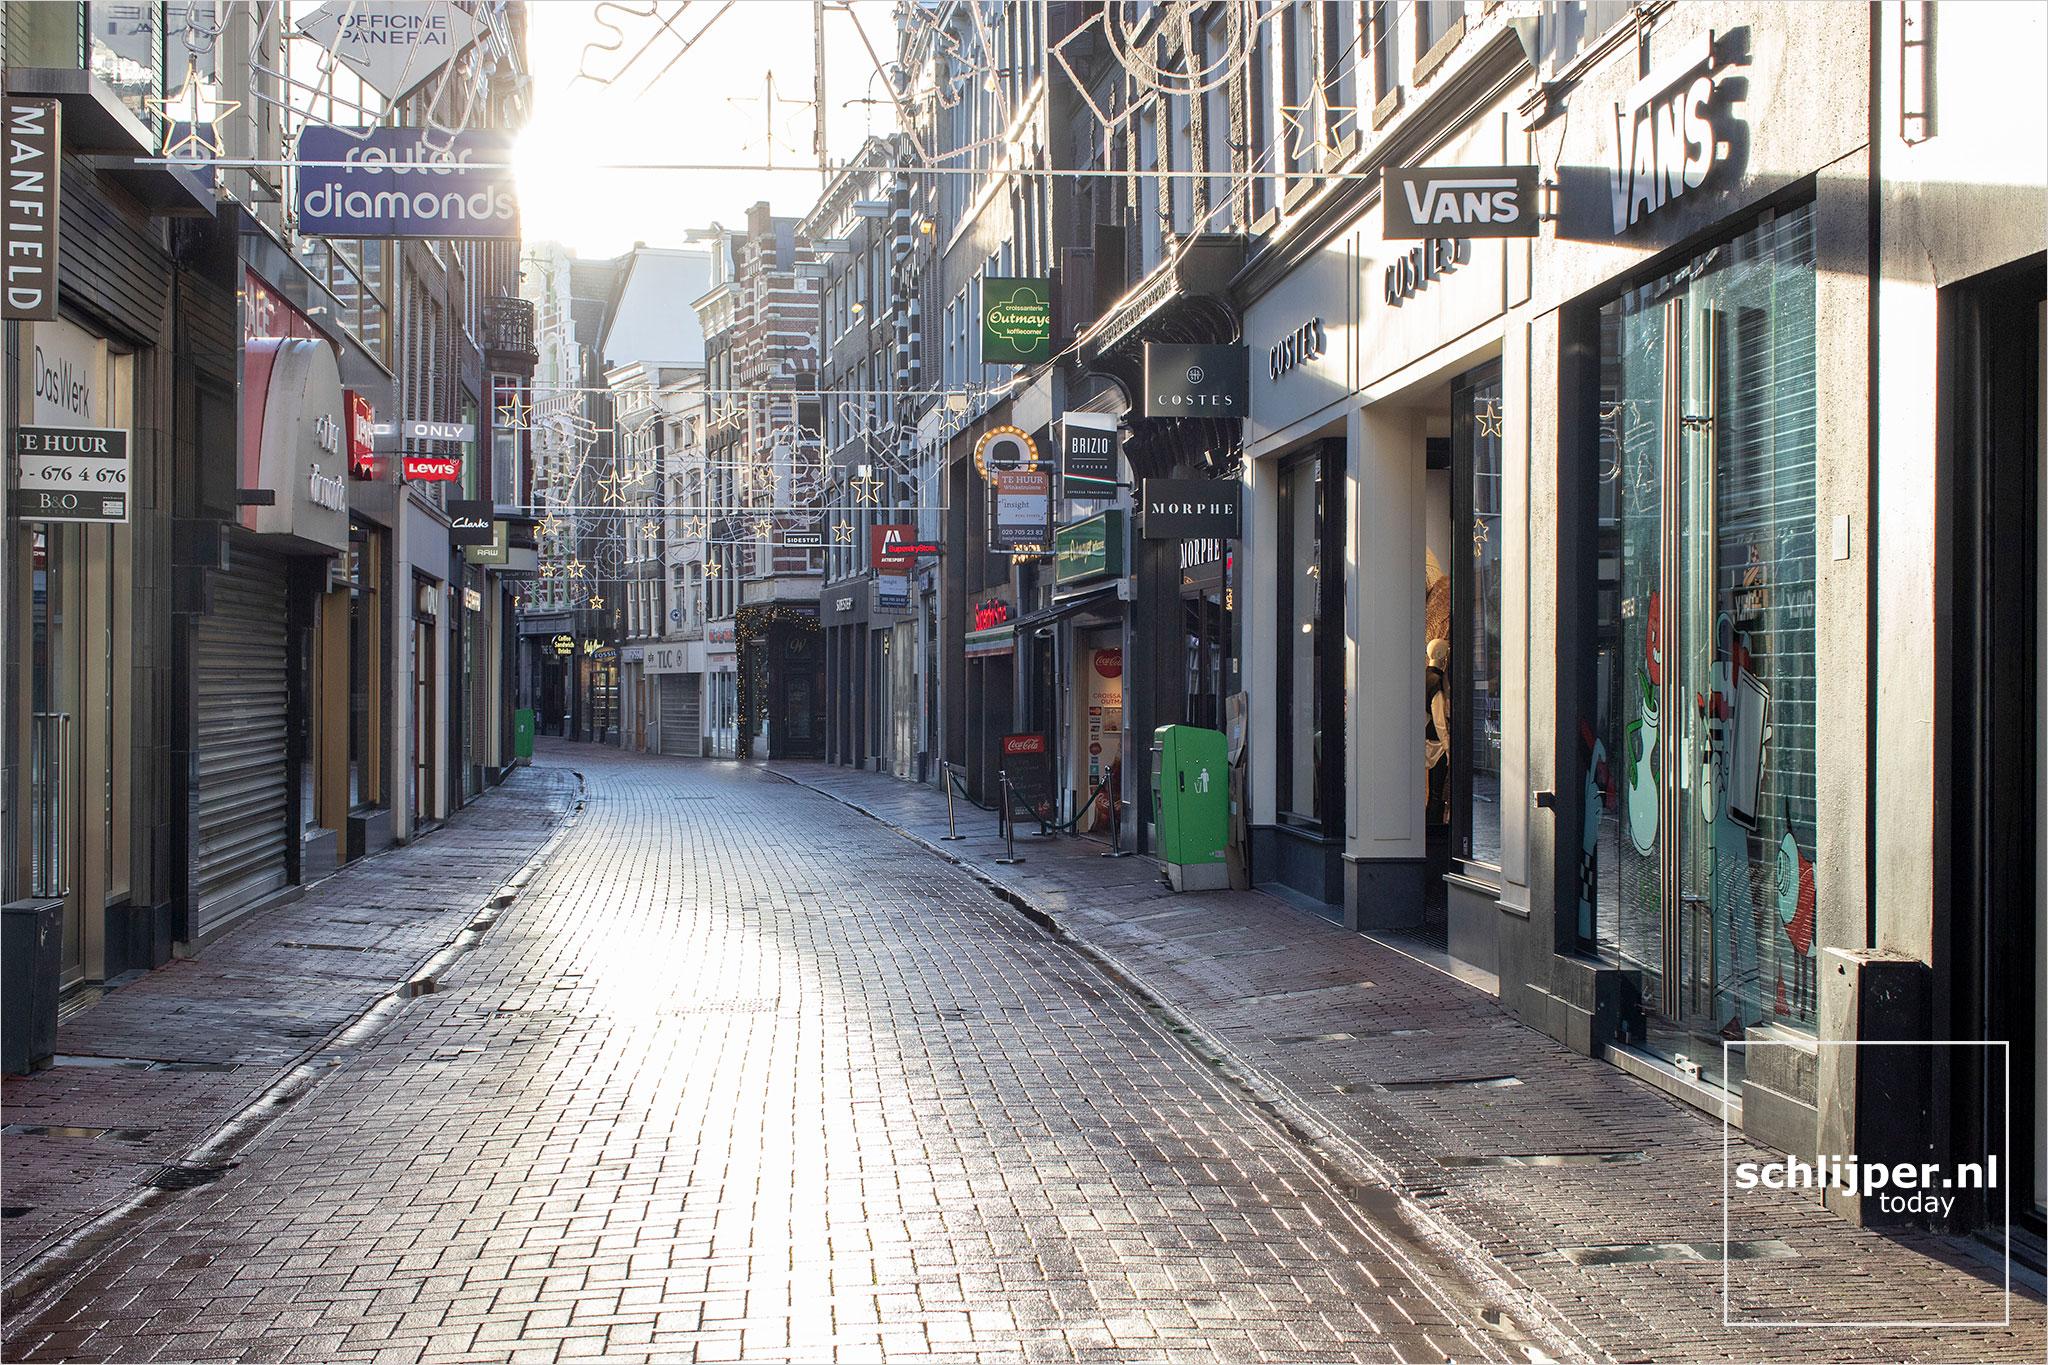 The Netherlands, Amsterdam, 30 december 2020